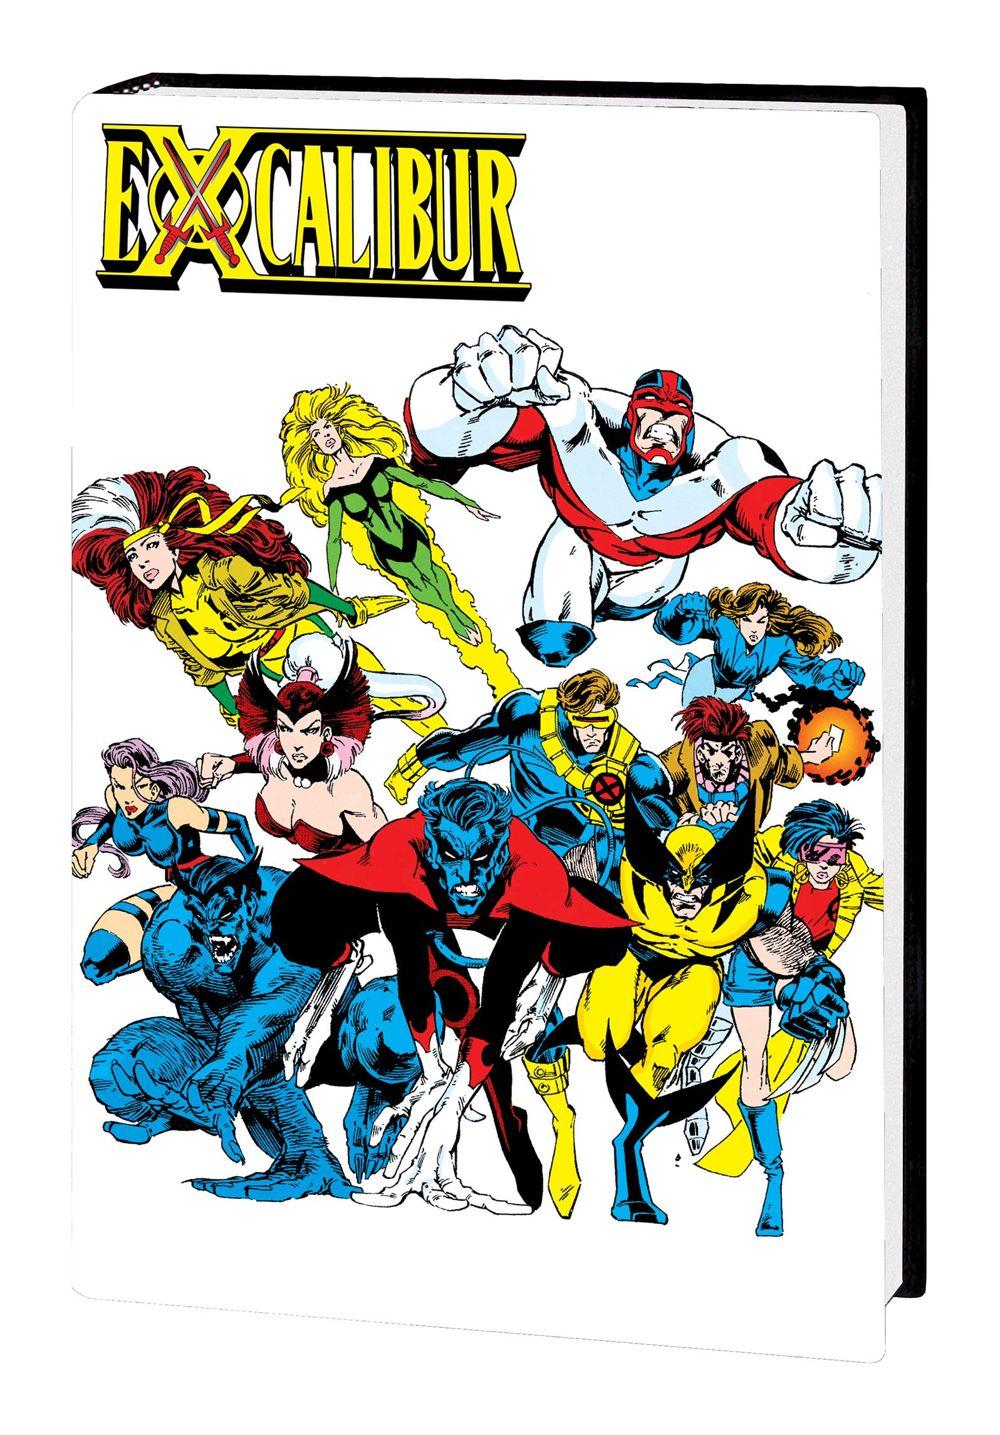 EXCALIBUR_OMNIBUS_V2_HC_DM Marvel Comics July 2021 Solicitations